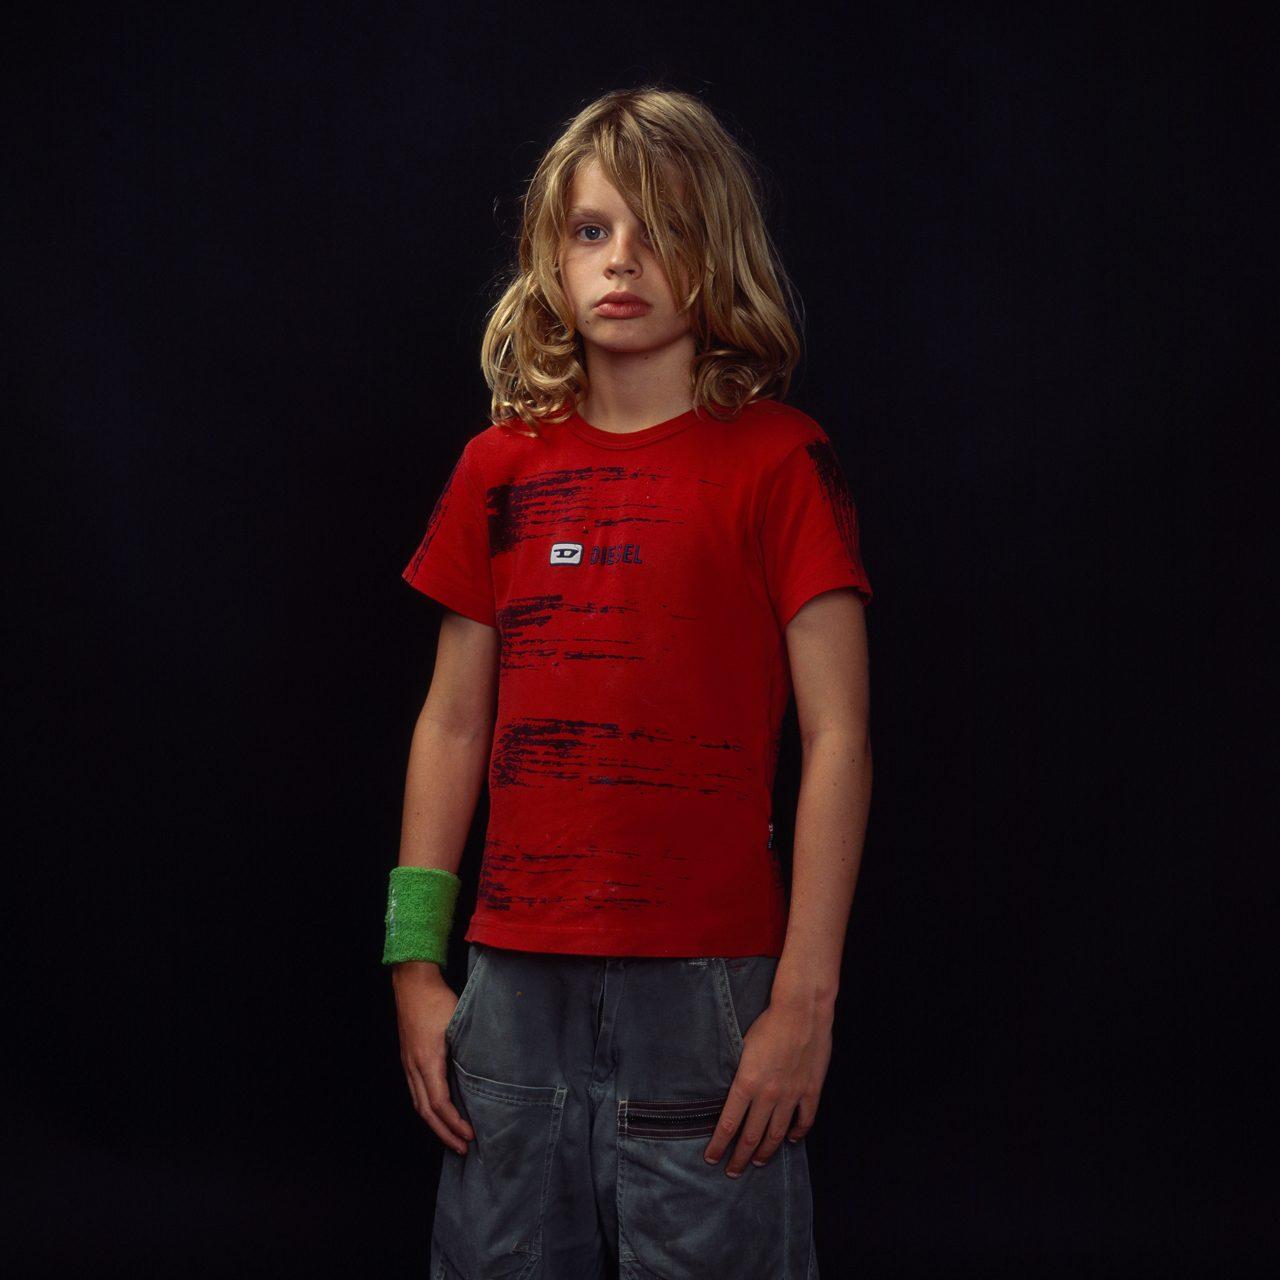 08-Boas1-(un)dressed-jasper-groen